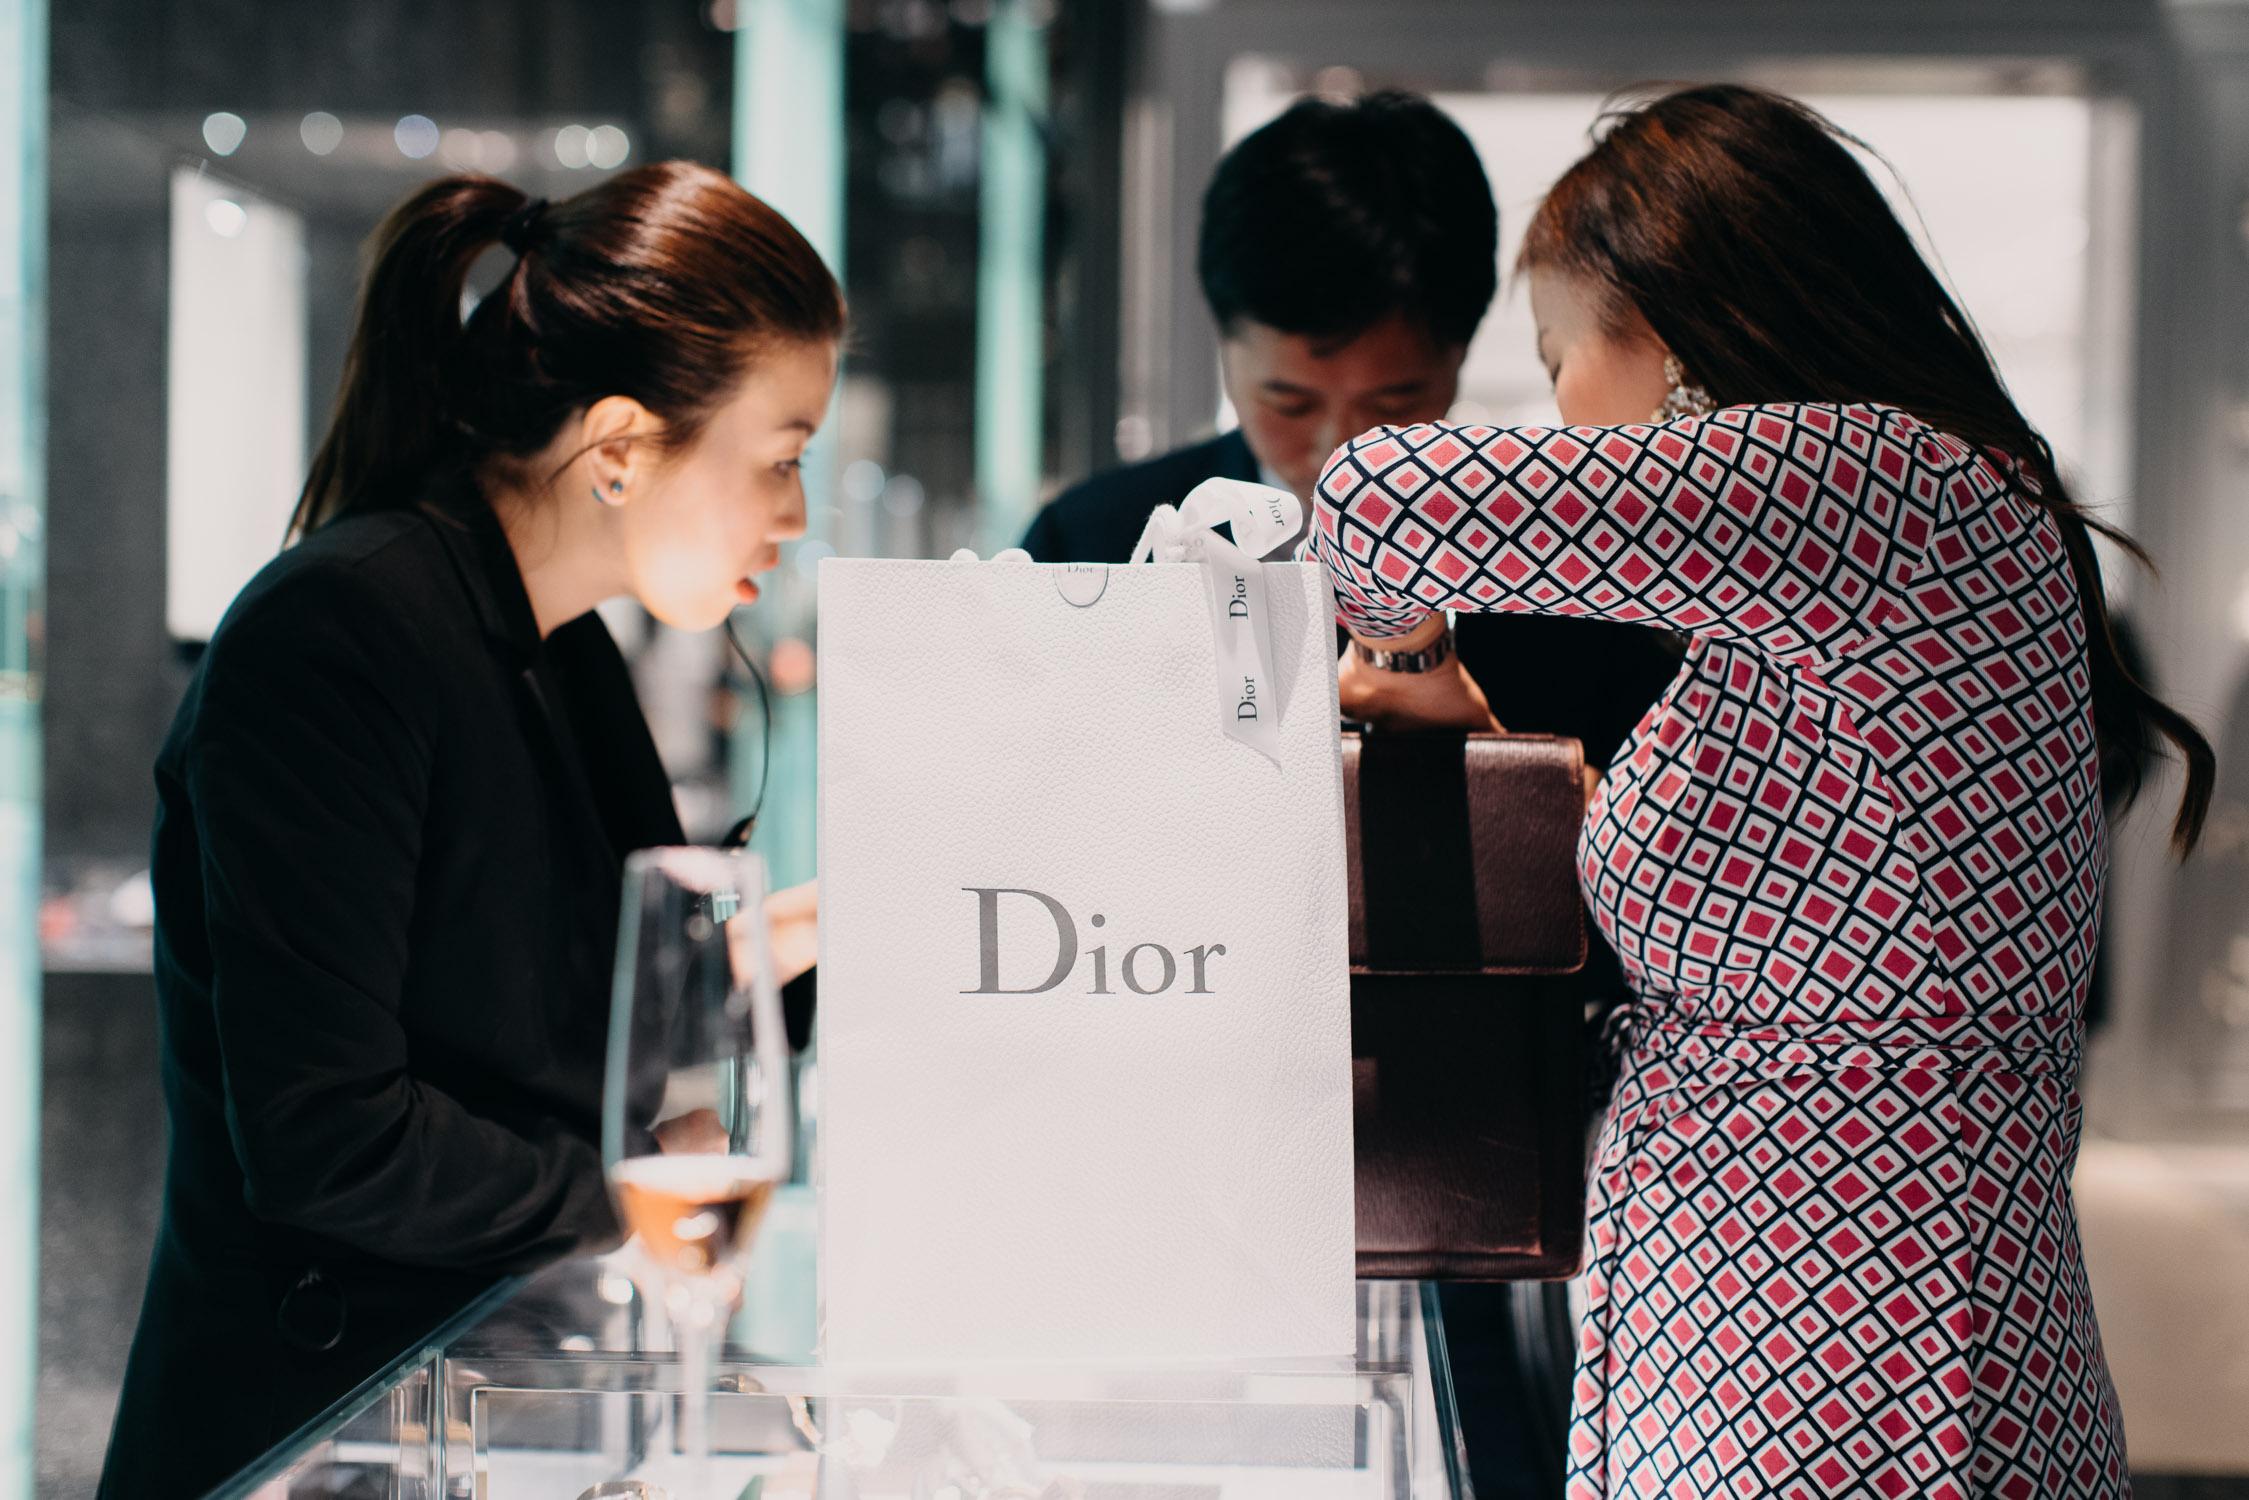 52-dior-hong-kong-womens-dior-event-photography.jpg